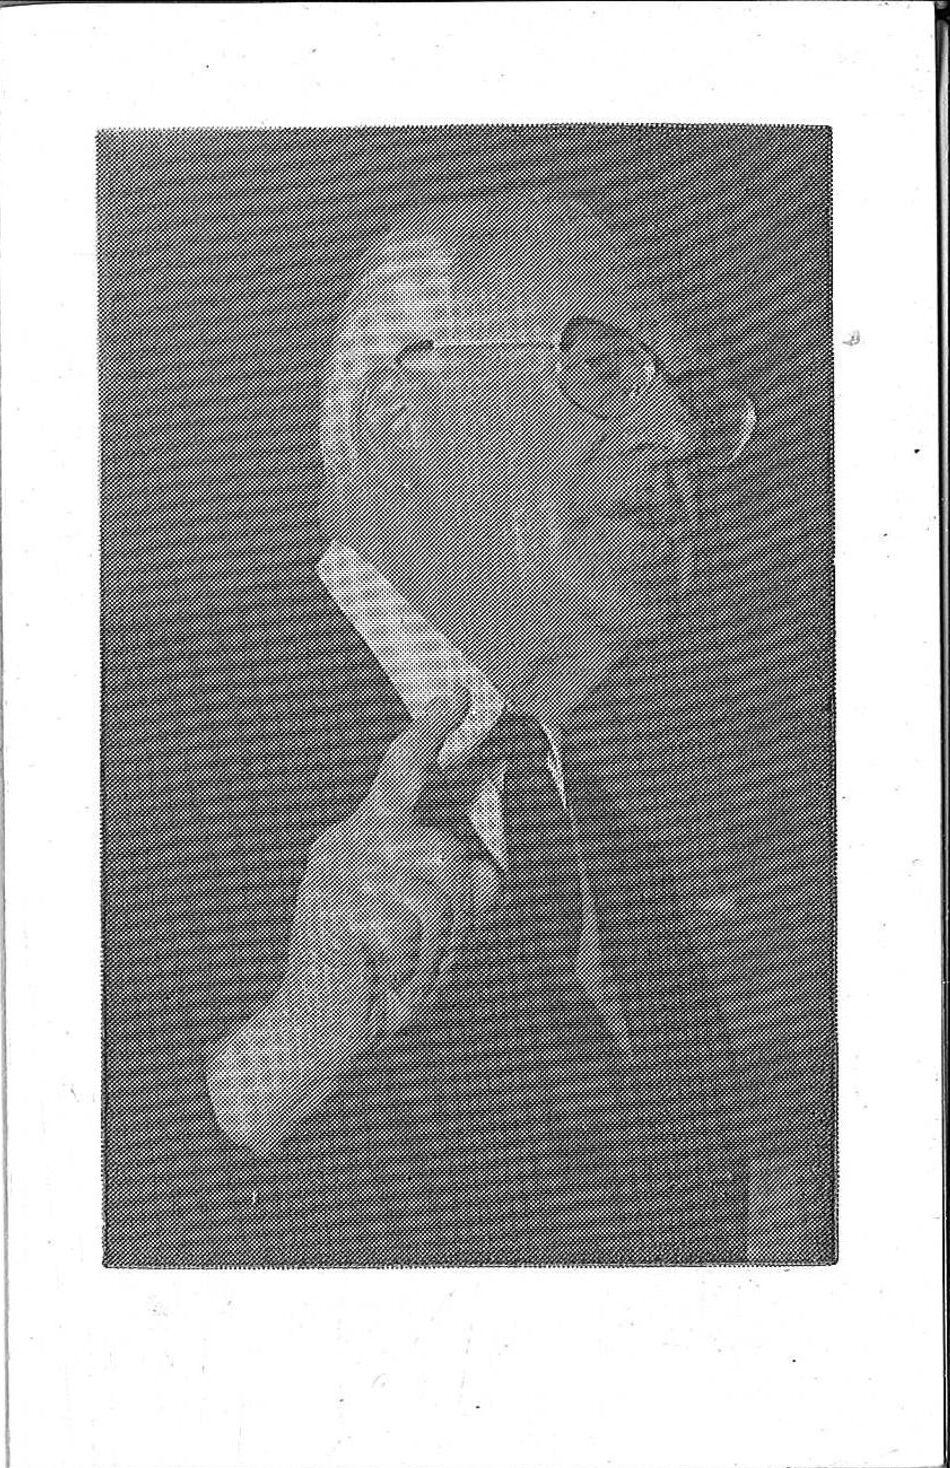 Coornaert Georges